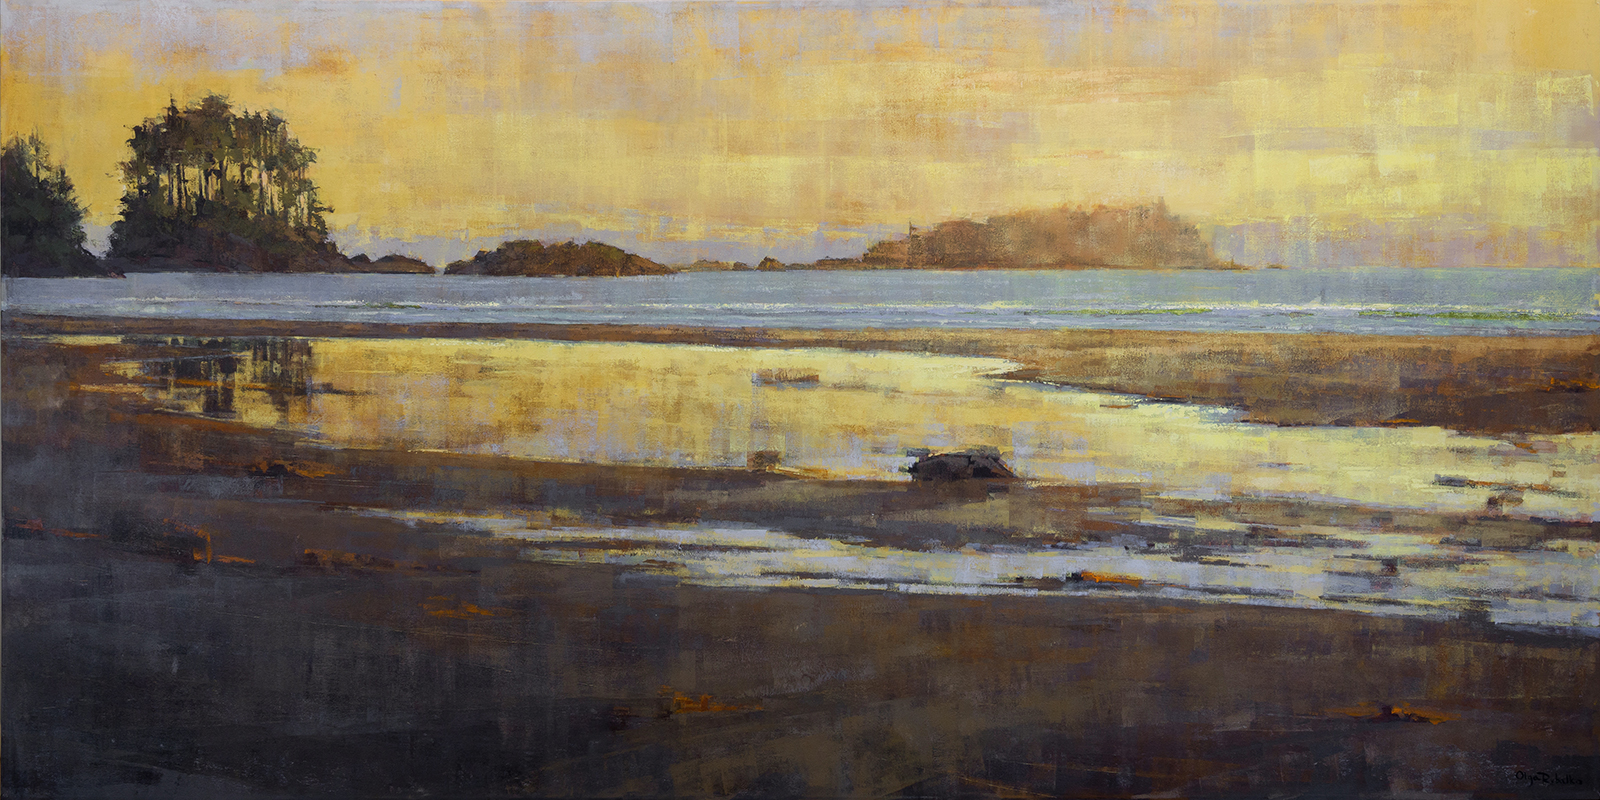 olga rybalko art - pacific rim - landscape beach sunset painting